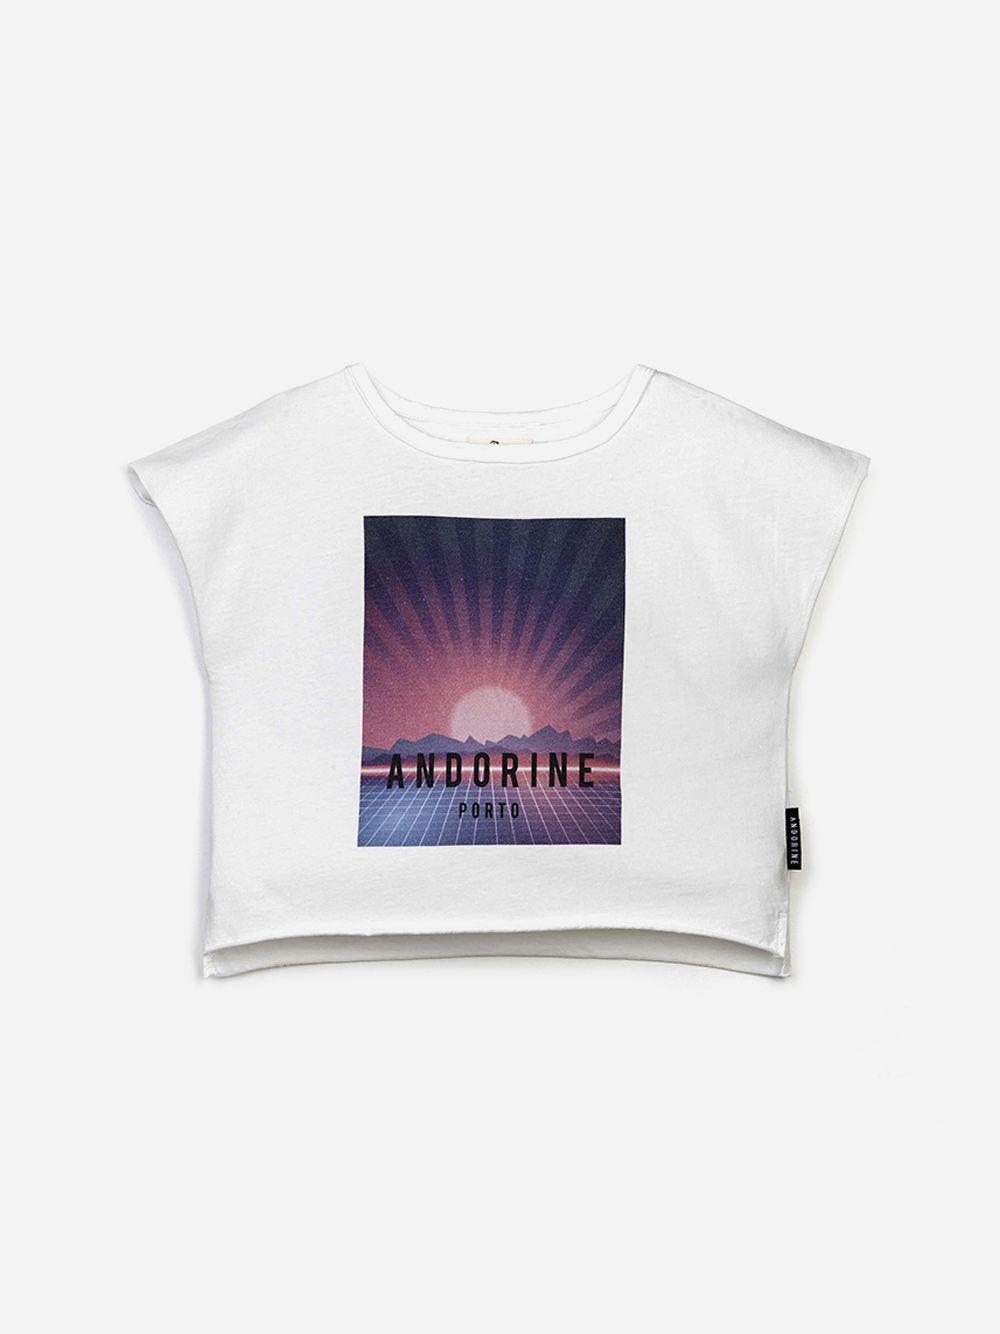 T-shirt Branca Estampada | Andorine